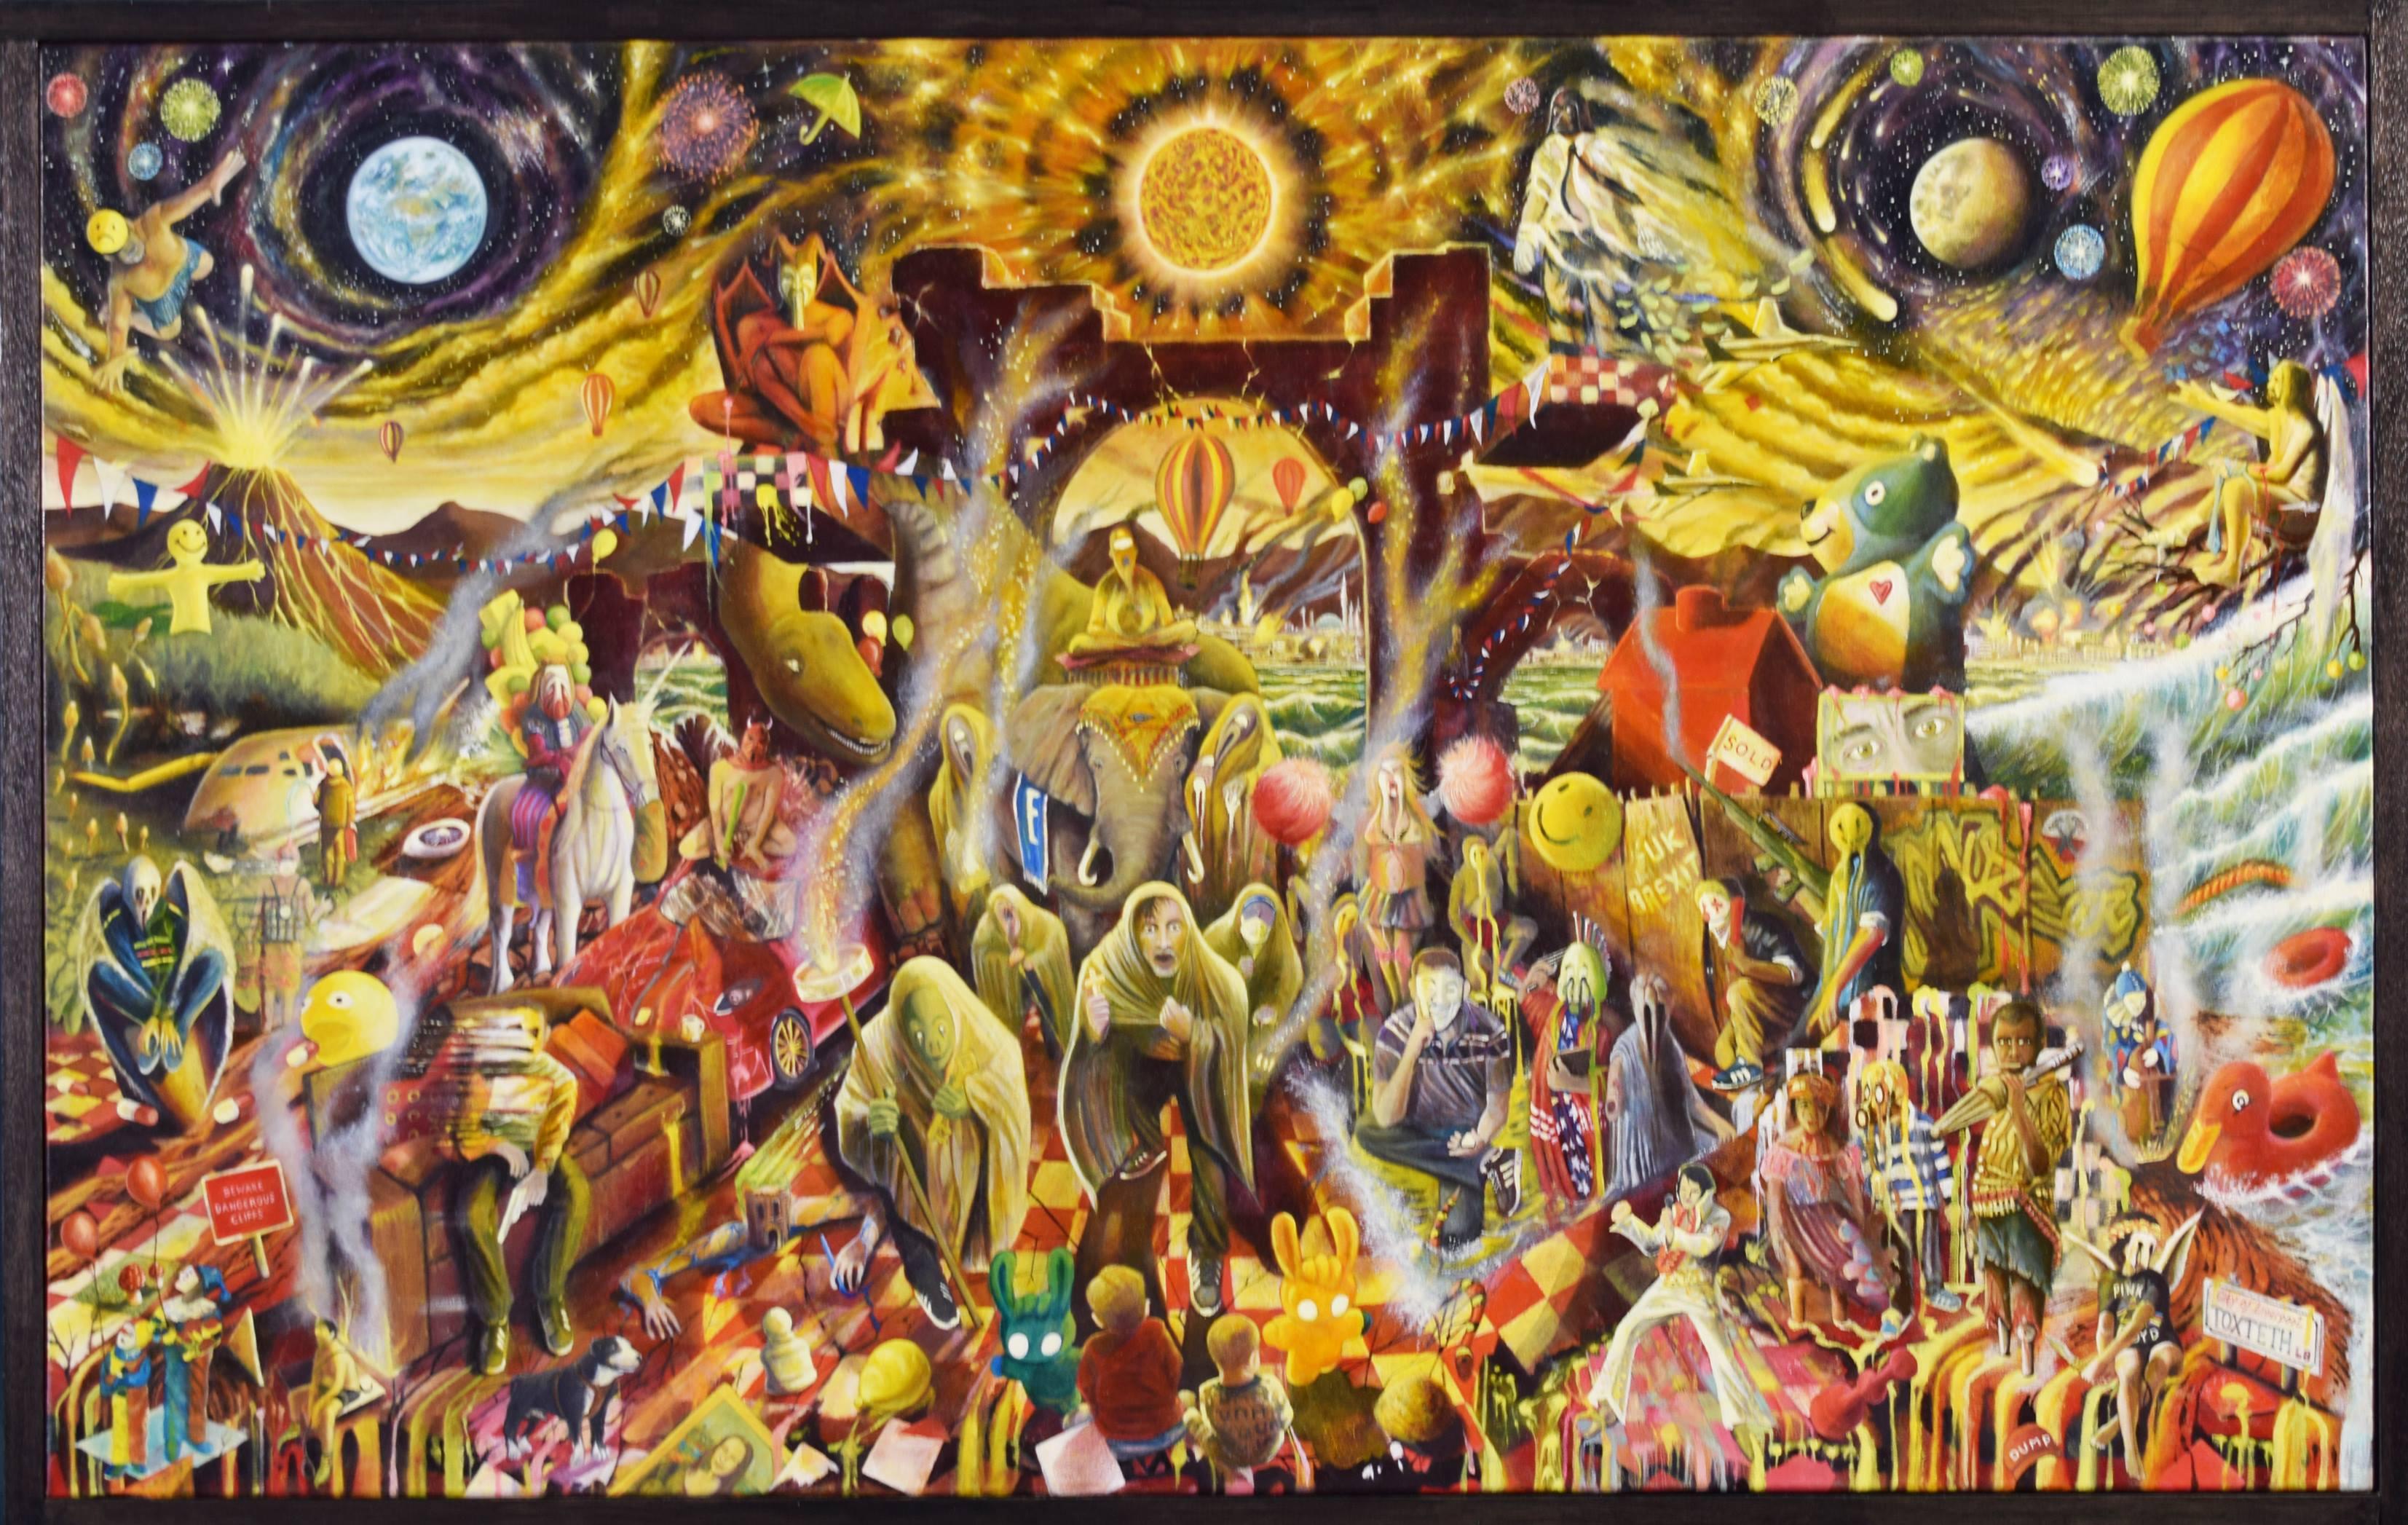 Alan Murray - The Damned Parade